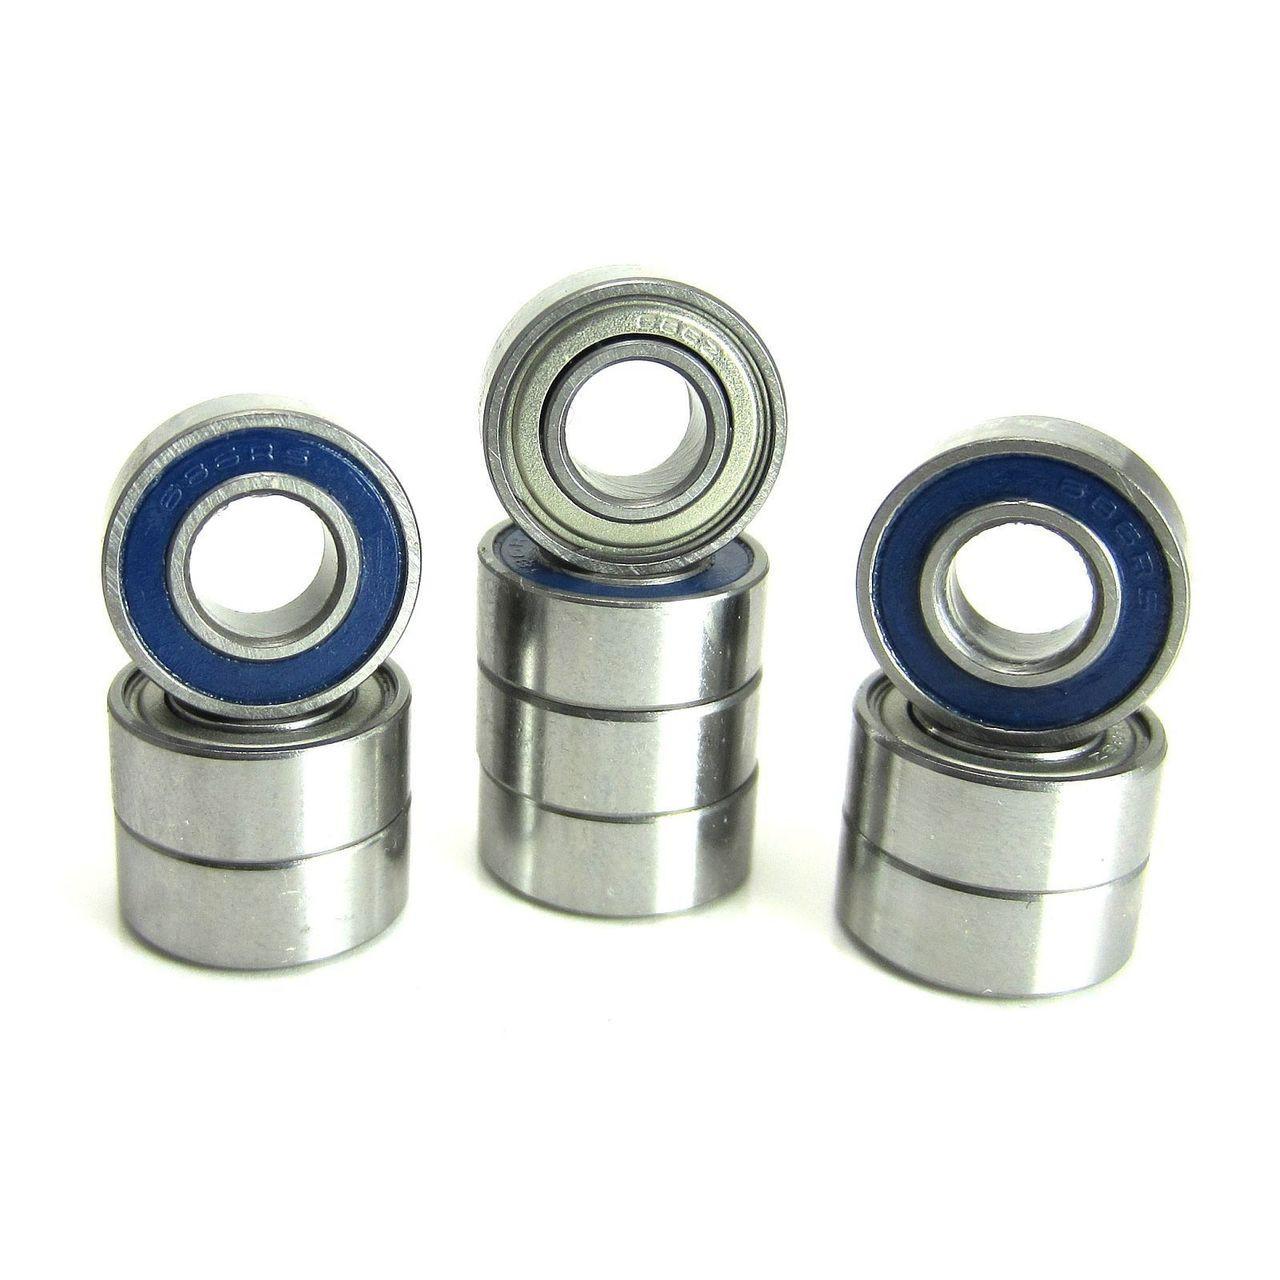 TRB RC 6x13x5mm Precision Ball Bearings ABEC 5 Hybrid Seals BLU (10)